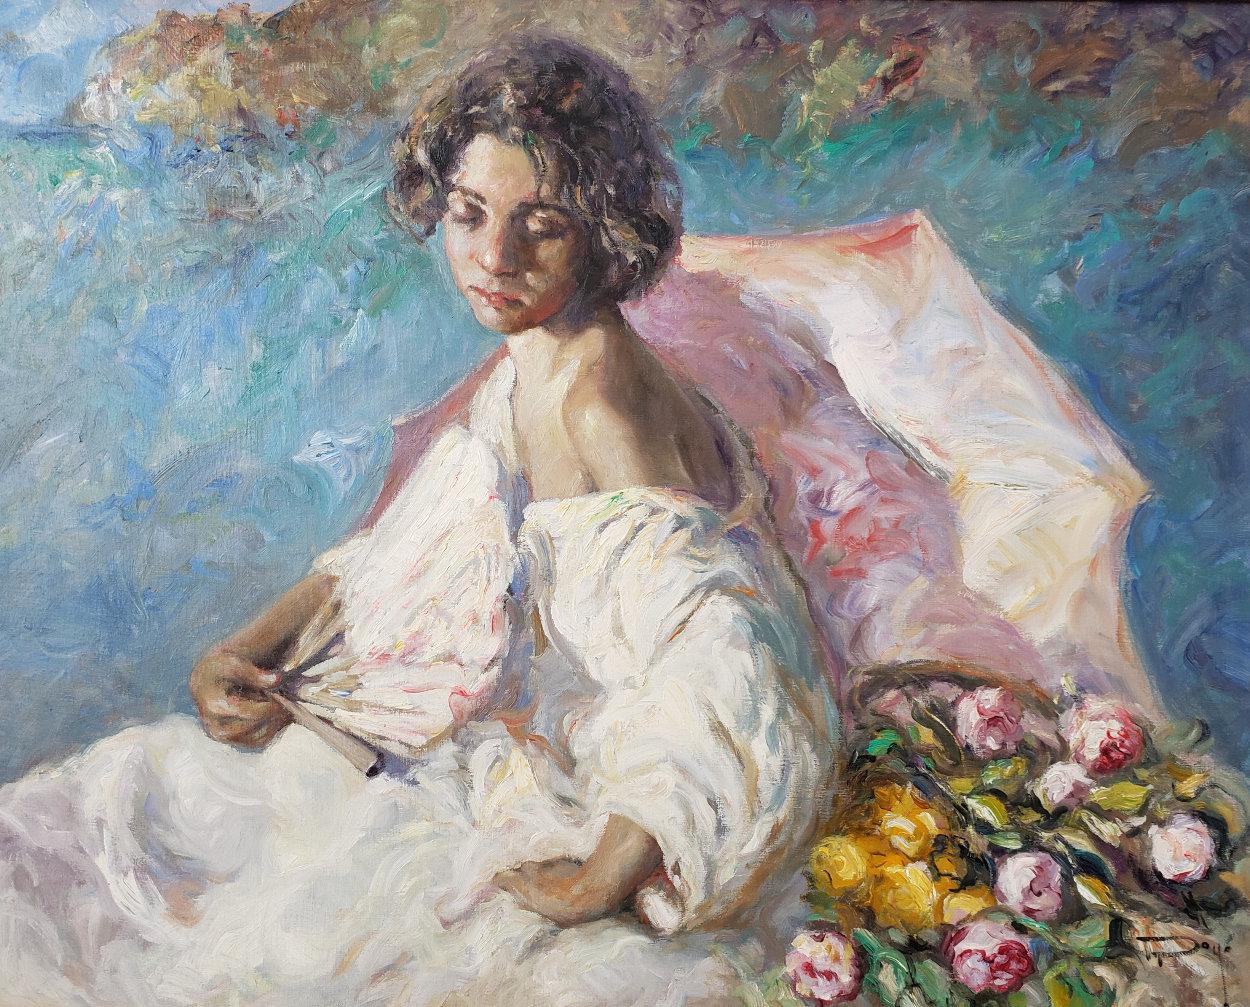 Atardecez 2004 44x51 Super Huge Original Painting by  Royo